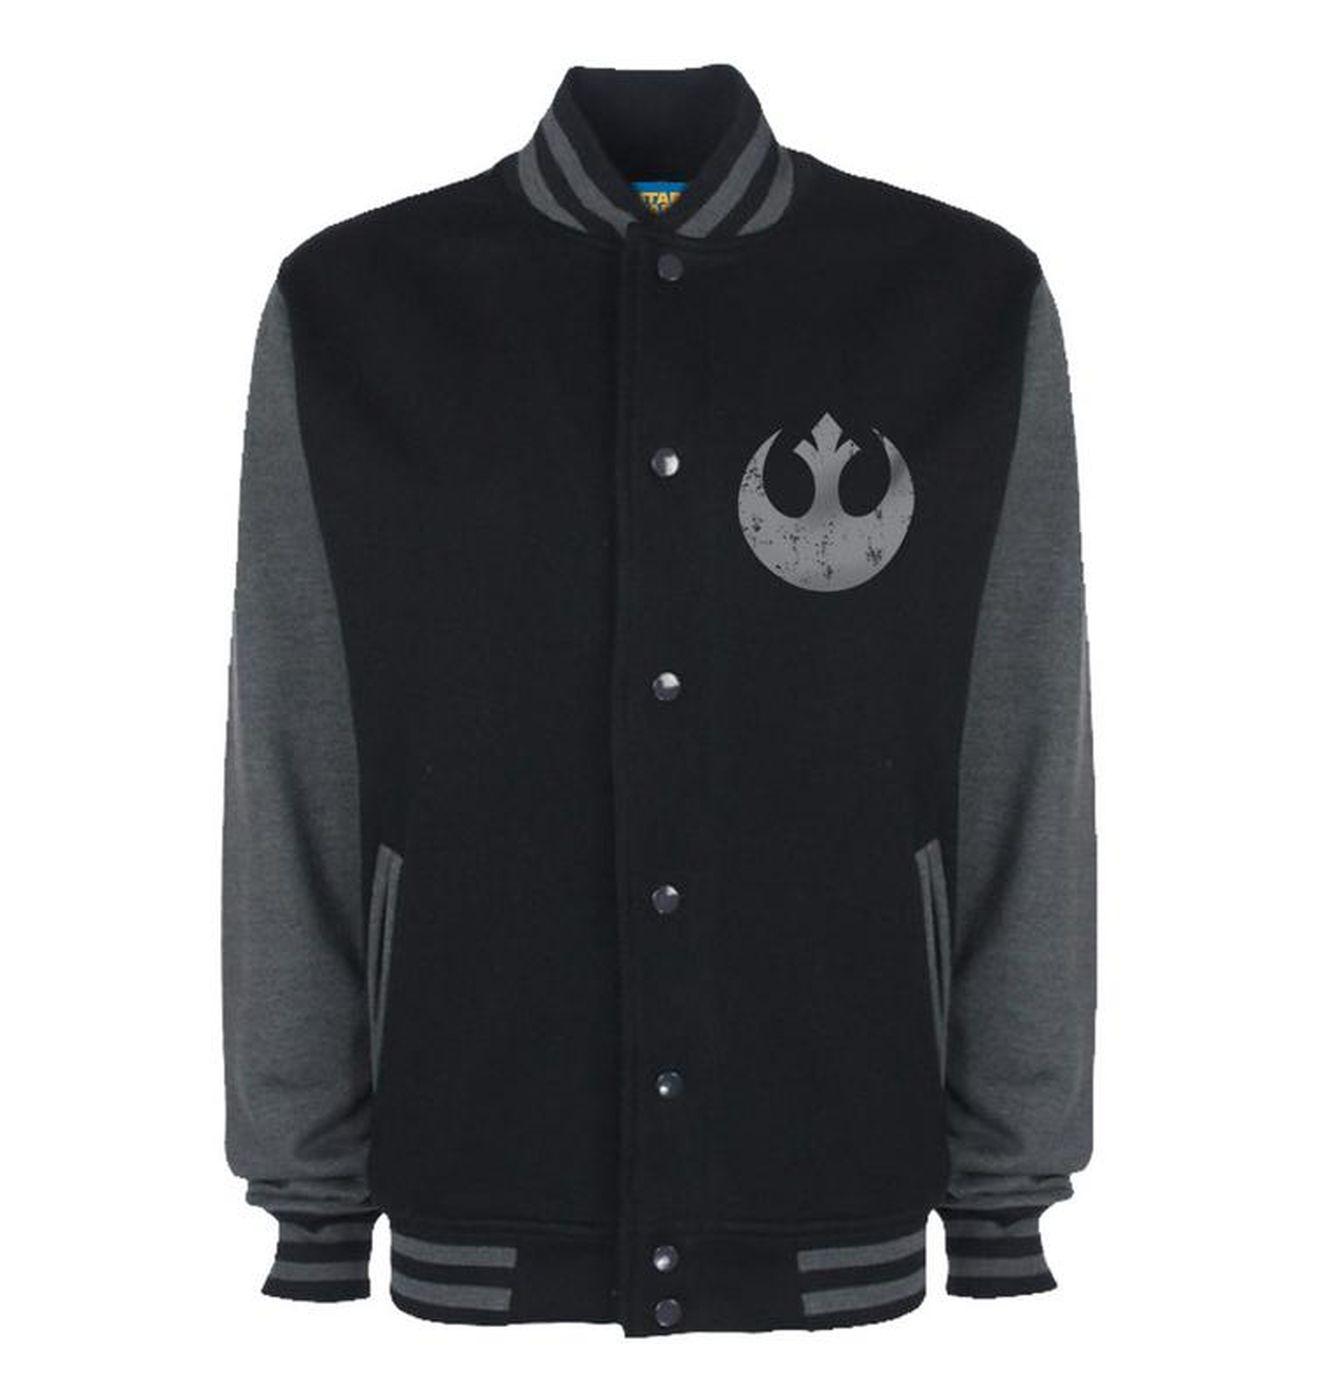 Star Wars Rebel jacket - OFFICIAL STAR WARS MERCHANDISE